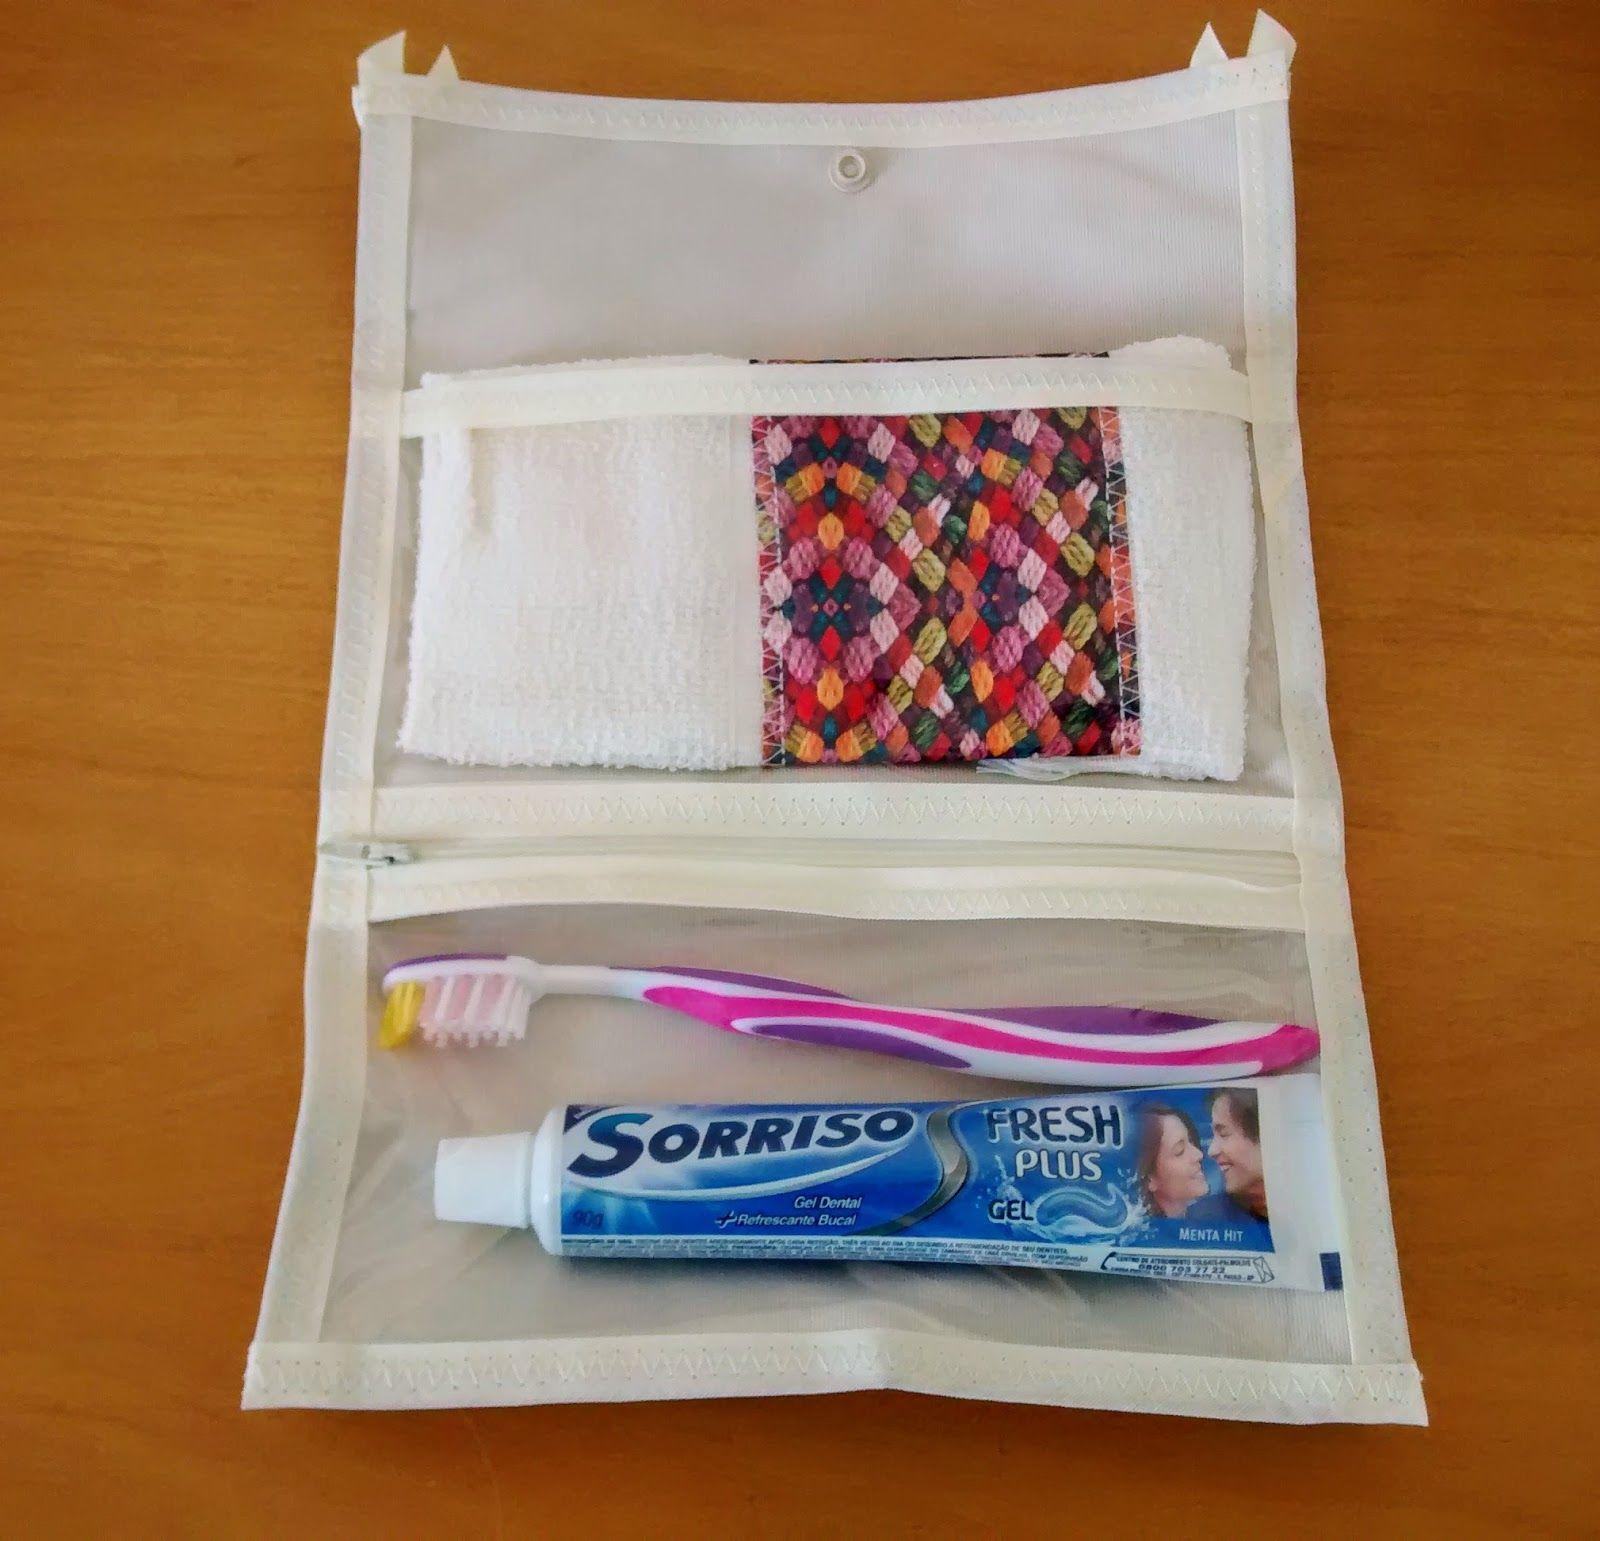 b57c1dd1b Kit higiene bucal Ideal para carregar dentro da bolsa